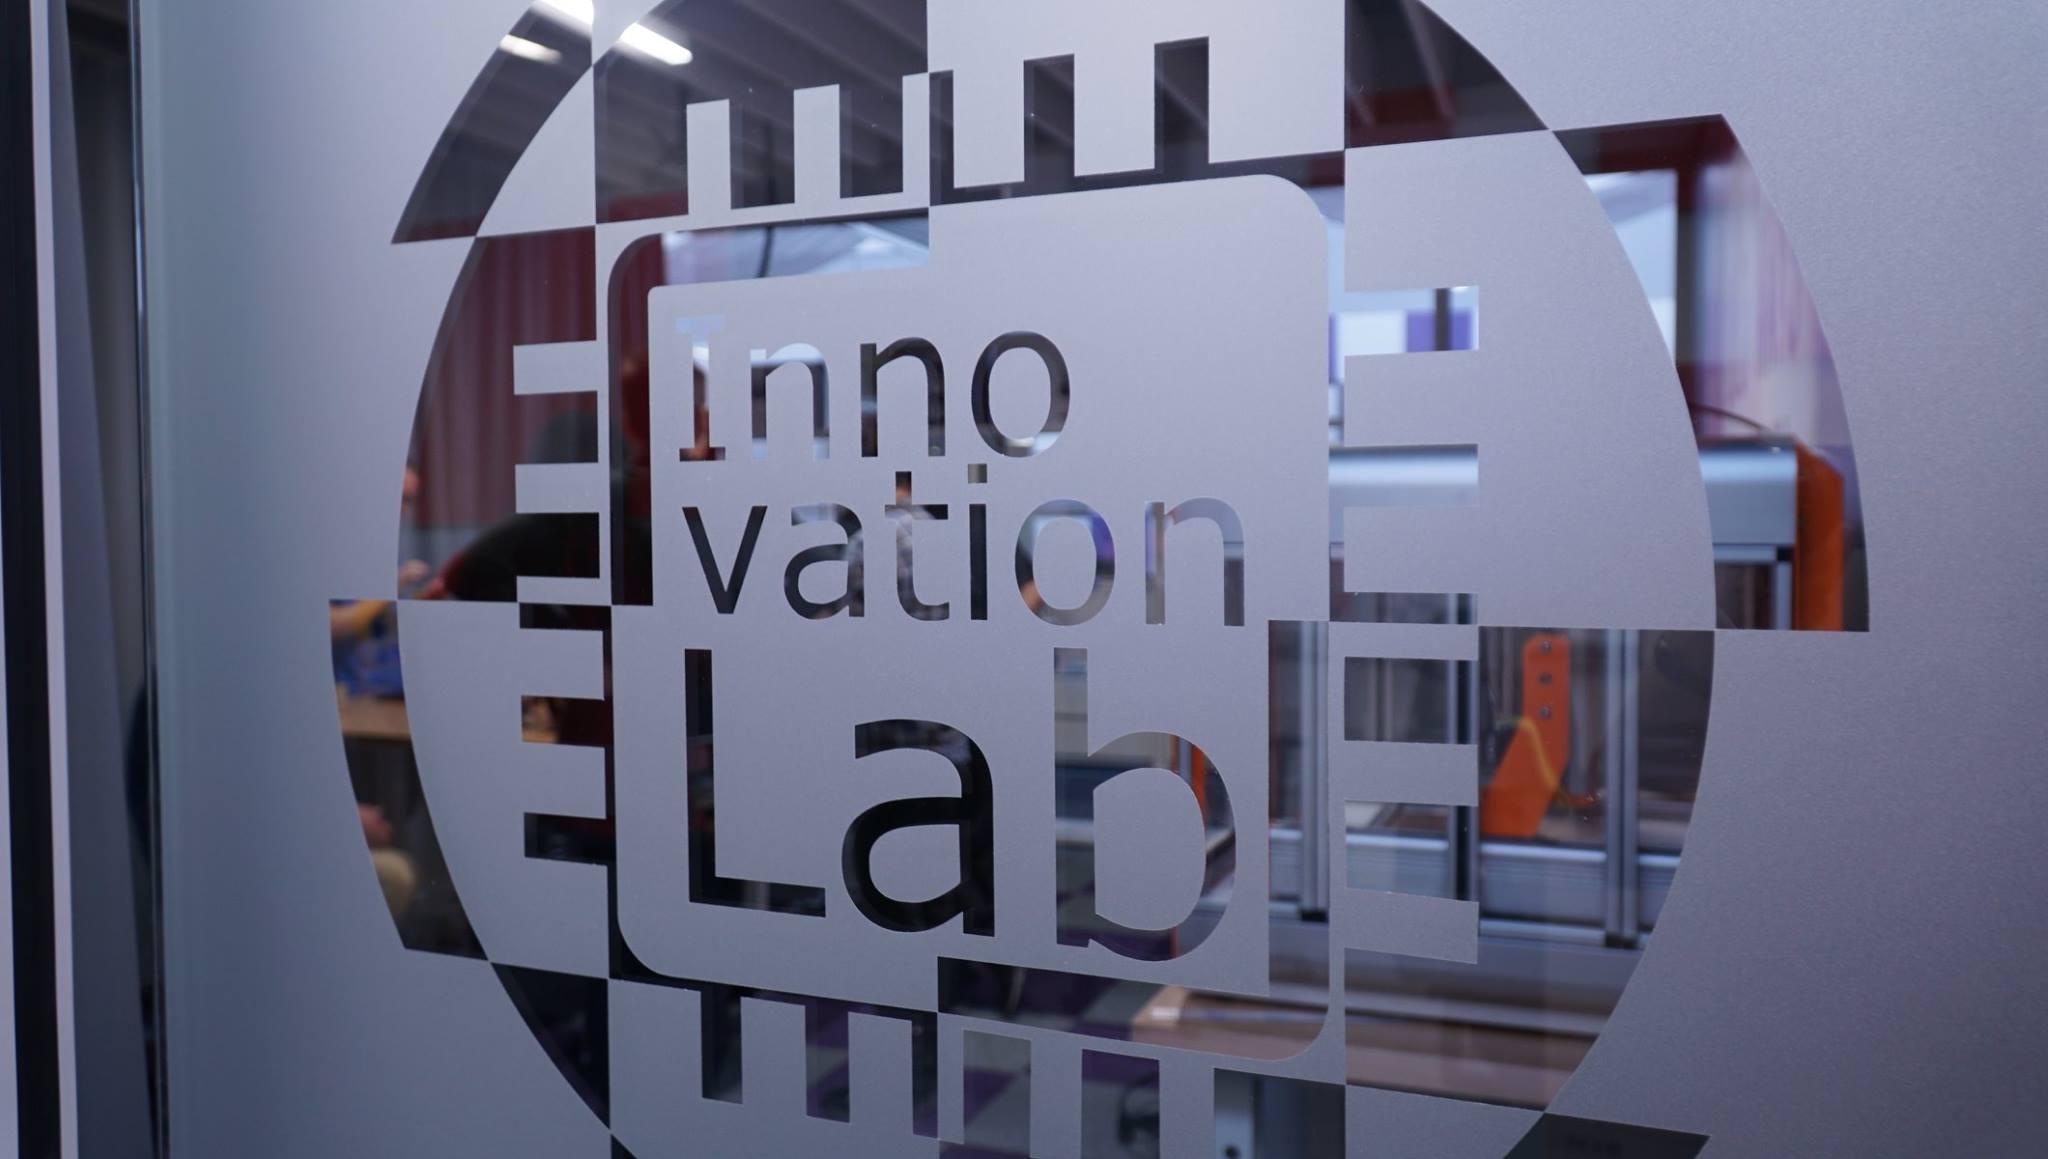 Innovation lab sabre poland for Innovation lab